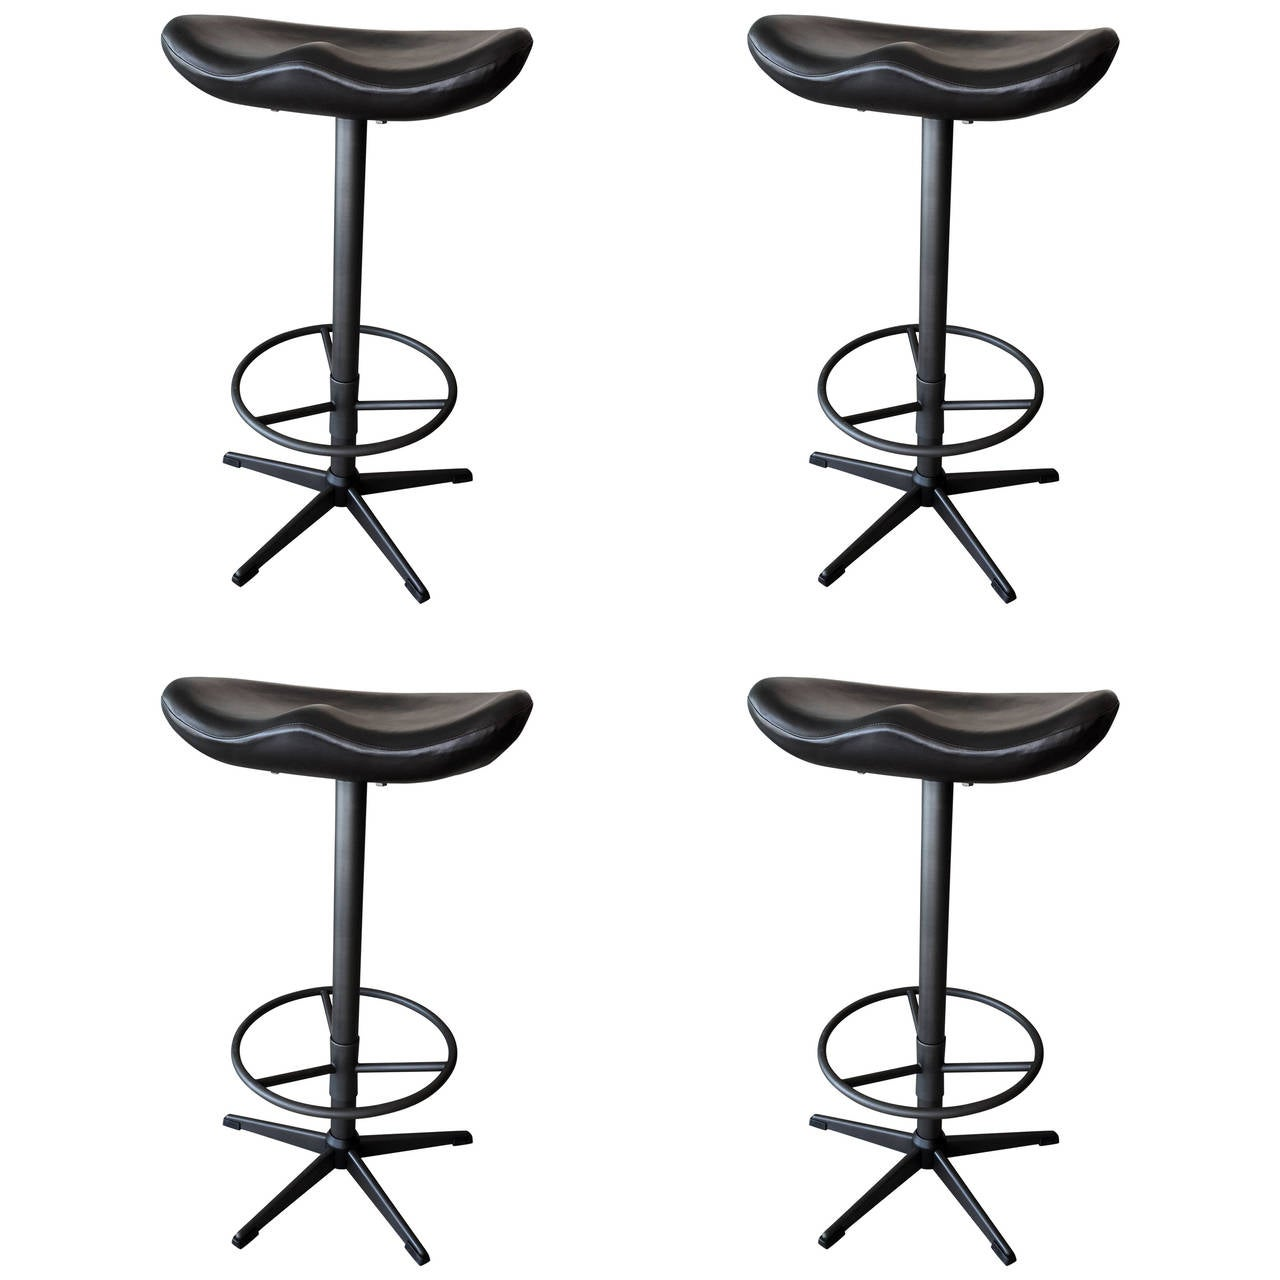 horse saddle seat chair yankees folding set of four swivel bar stools at 1stdibs